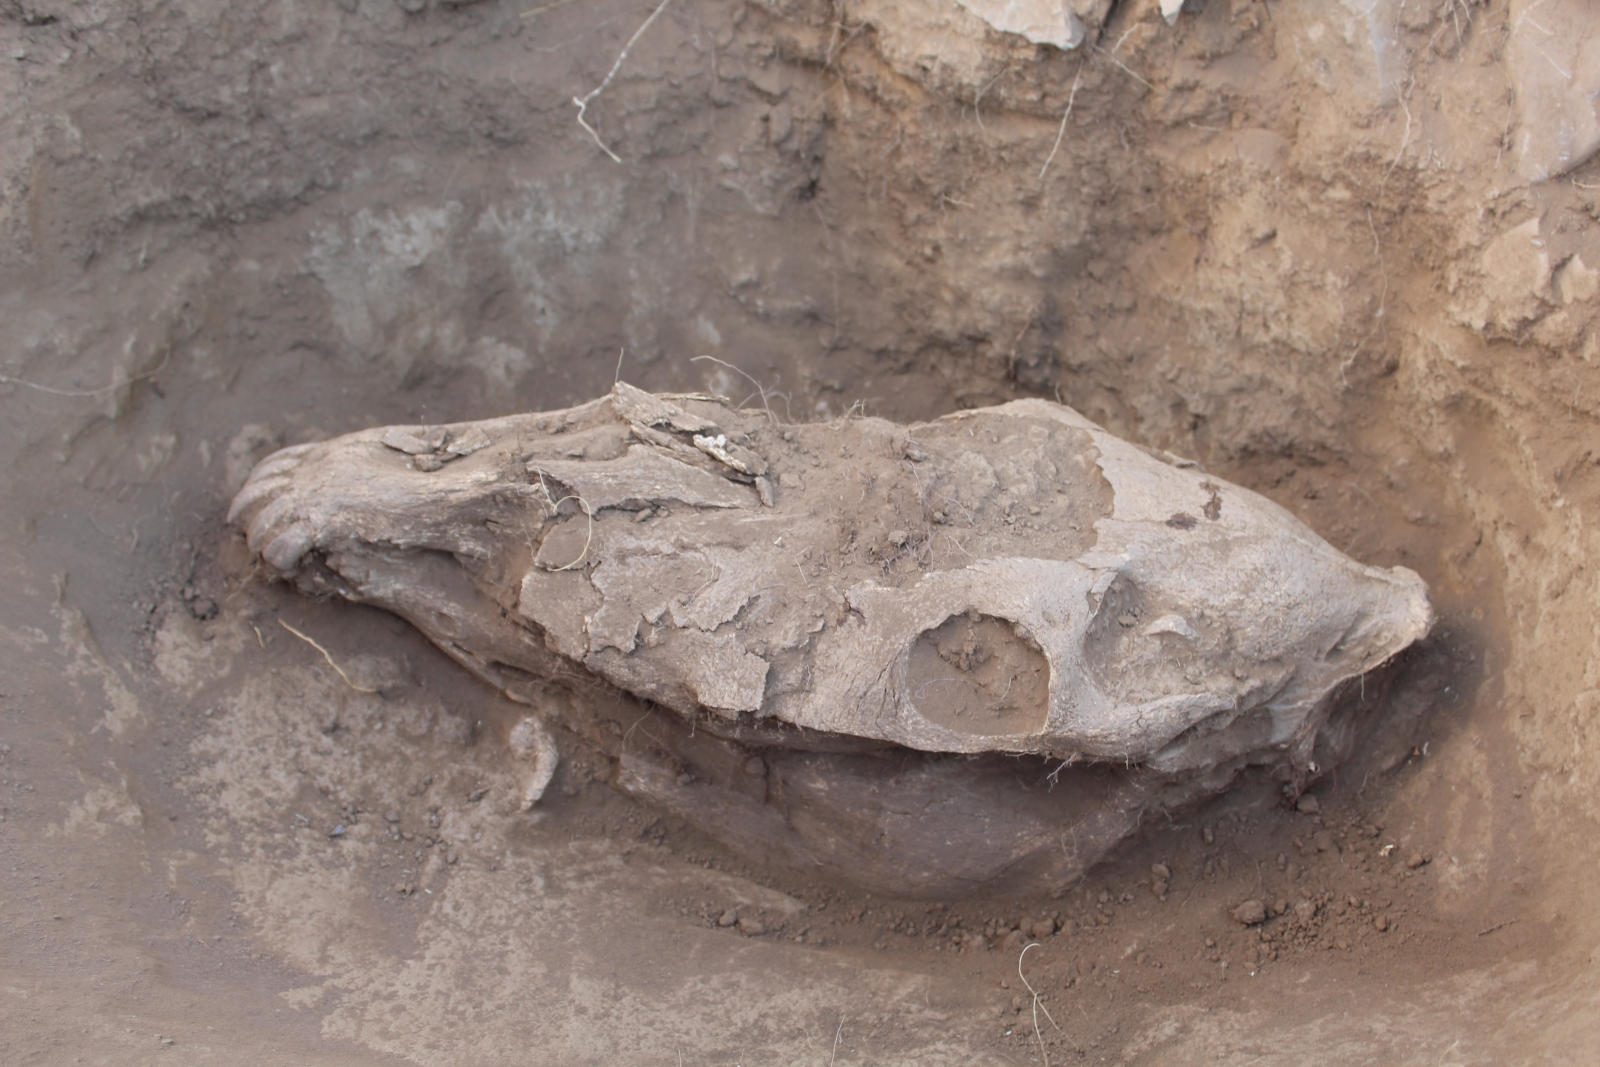 Horse burial